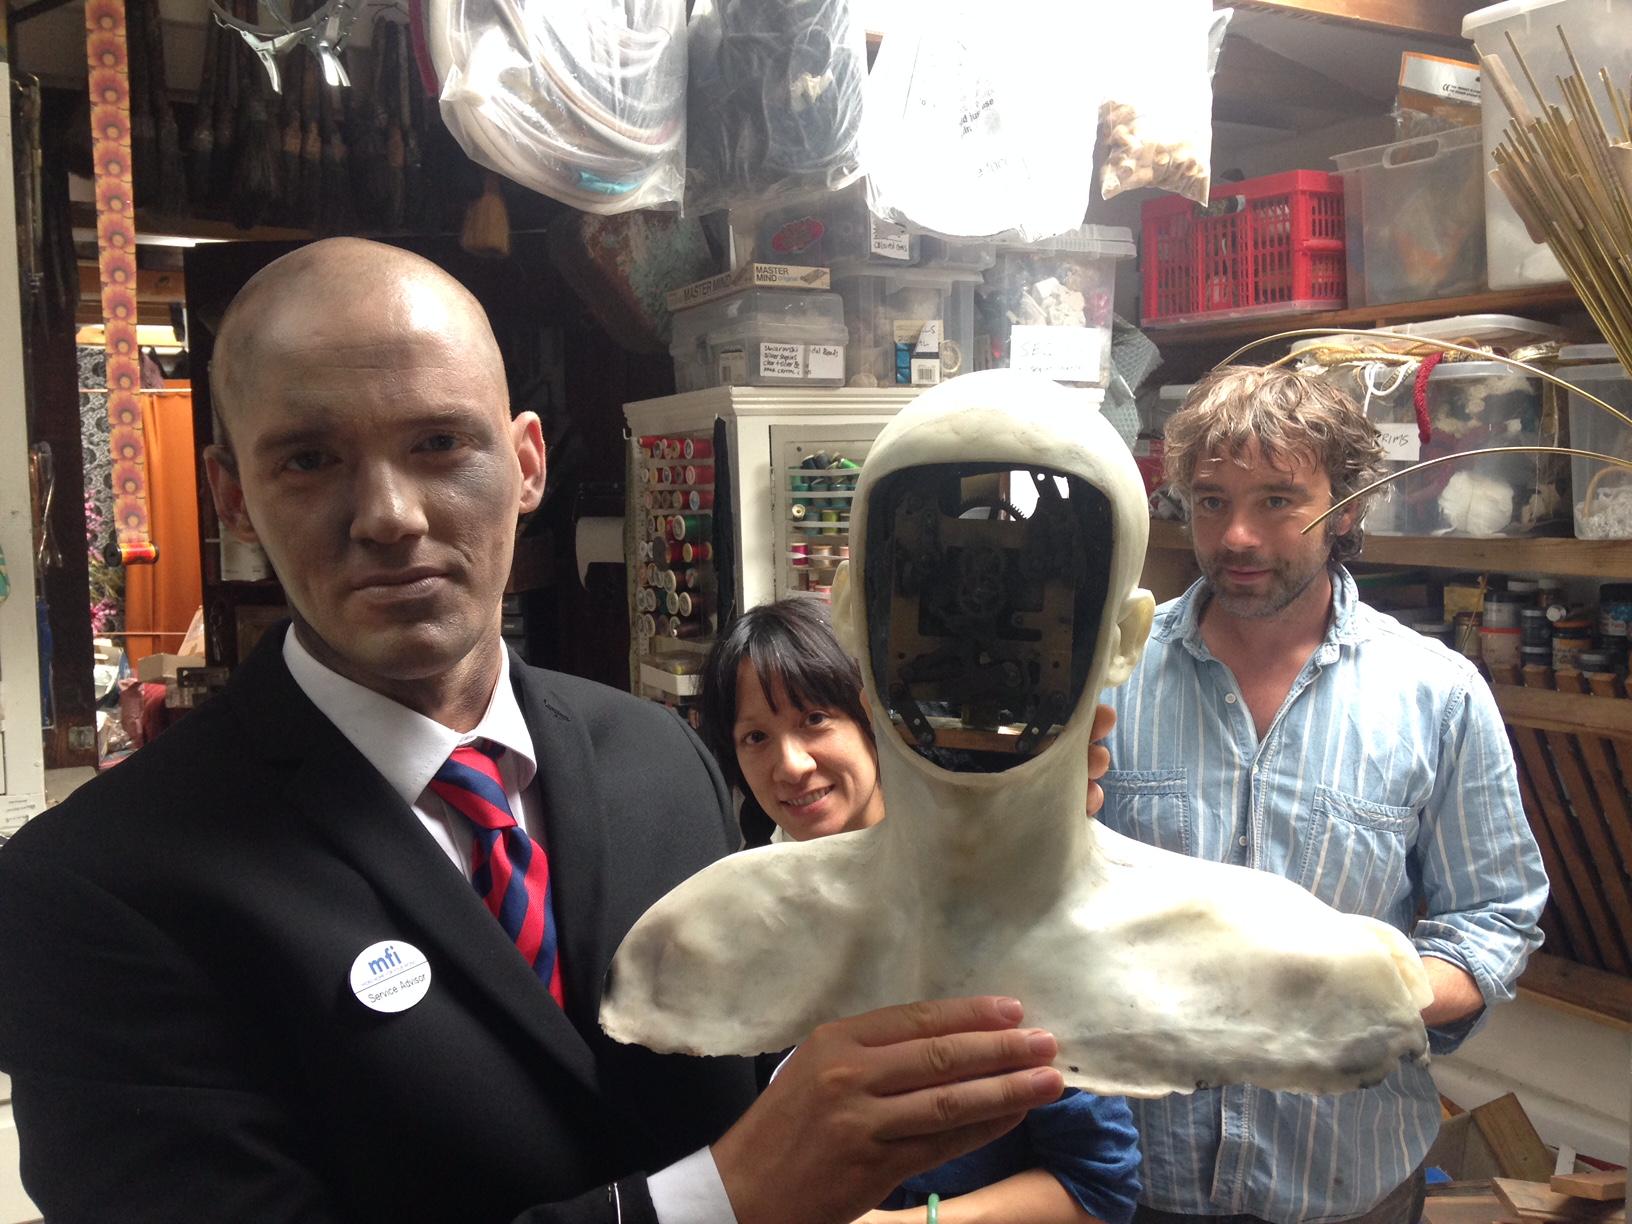 (Left to right, inside Natasha Lawes' studio) Reuben Hollebon, Natasha Lawes, Reuben Hollebon's robot, James Slater